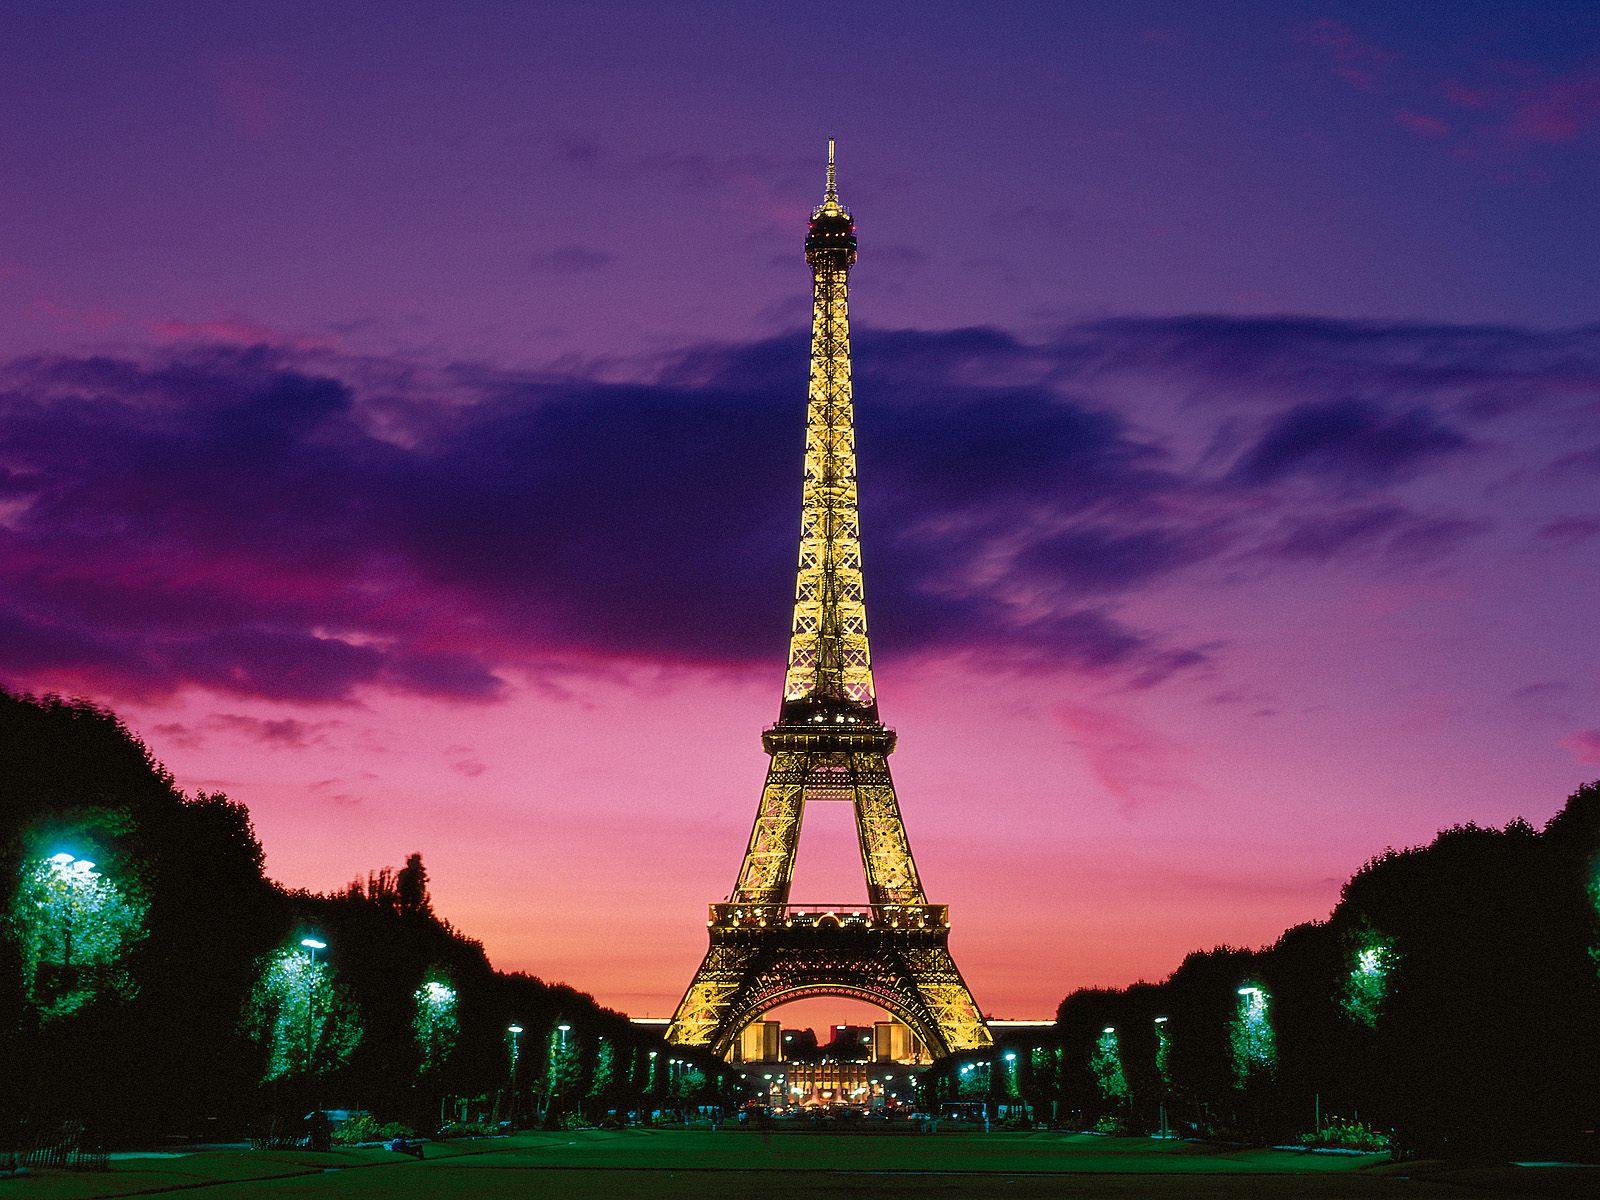 TOP HD WALLPAPERS: BEAUTIFUL PARIS HD WALLPAPERS